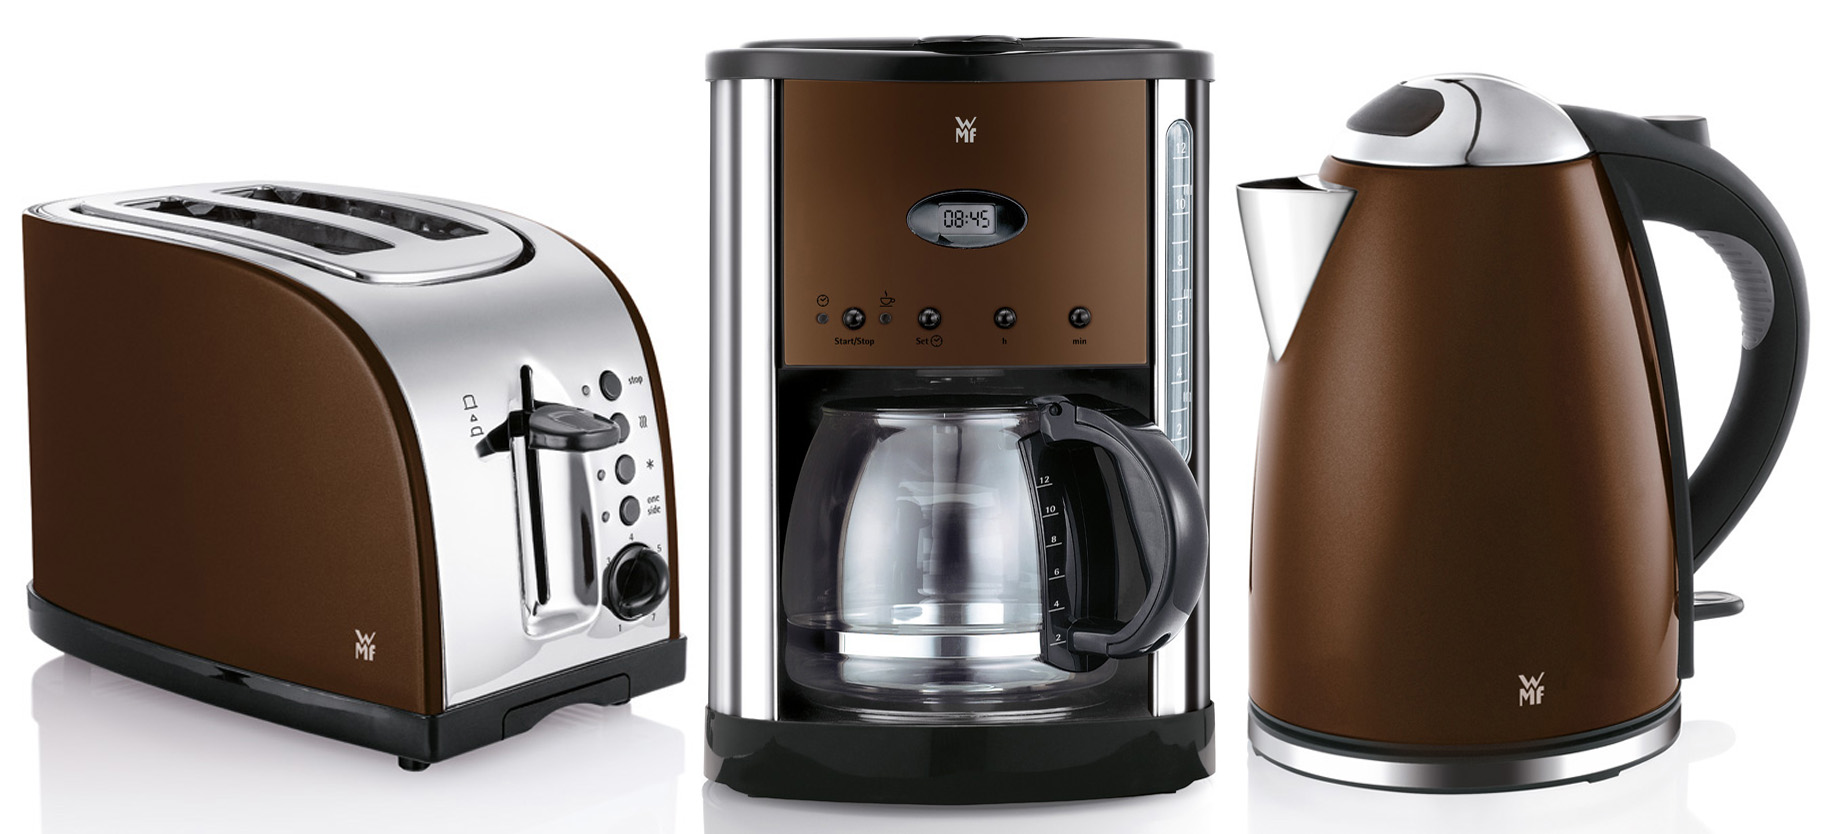 wmf terra fr hst cksset wmf terra filterkaffeemaschine wasserkocher toaster fr hst cksset. Black Bedroom Furniture Sets. Home Design Ideas